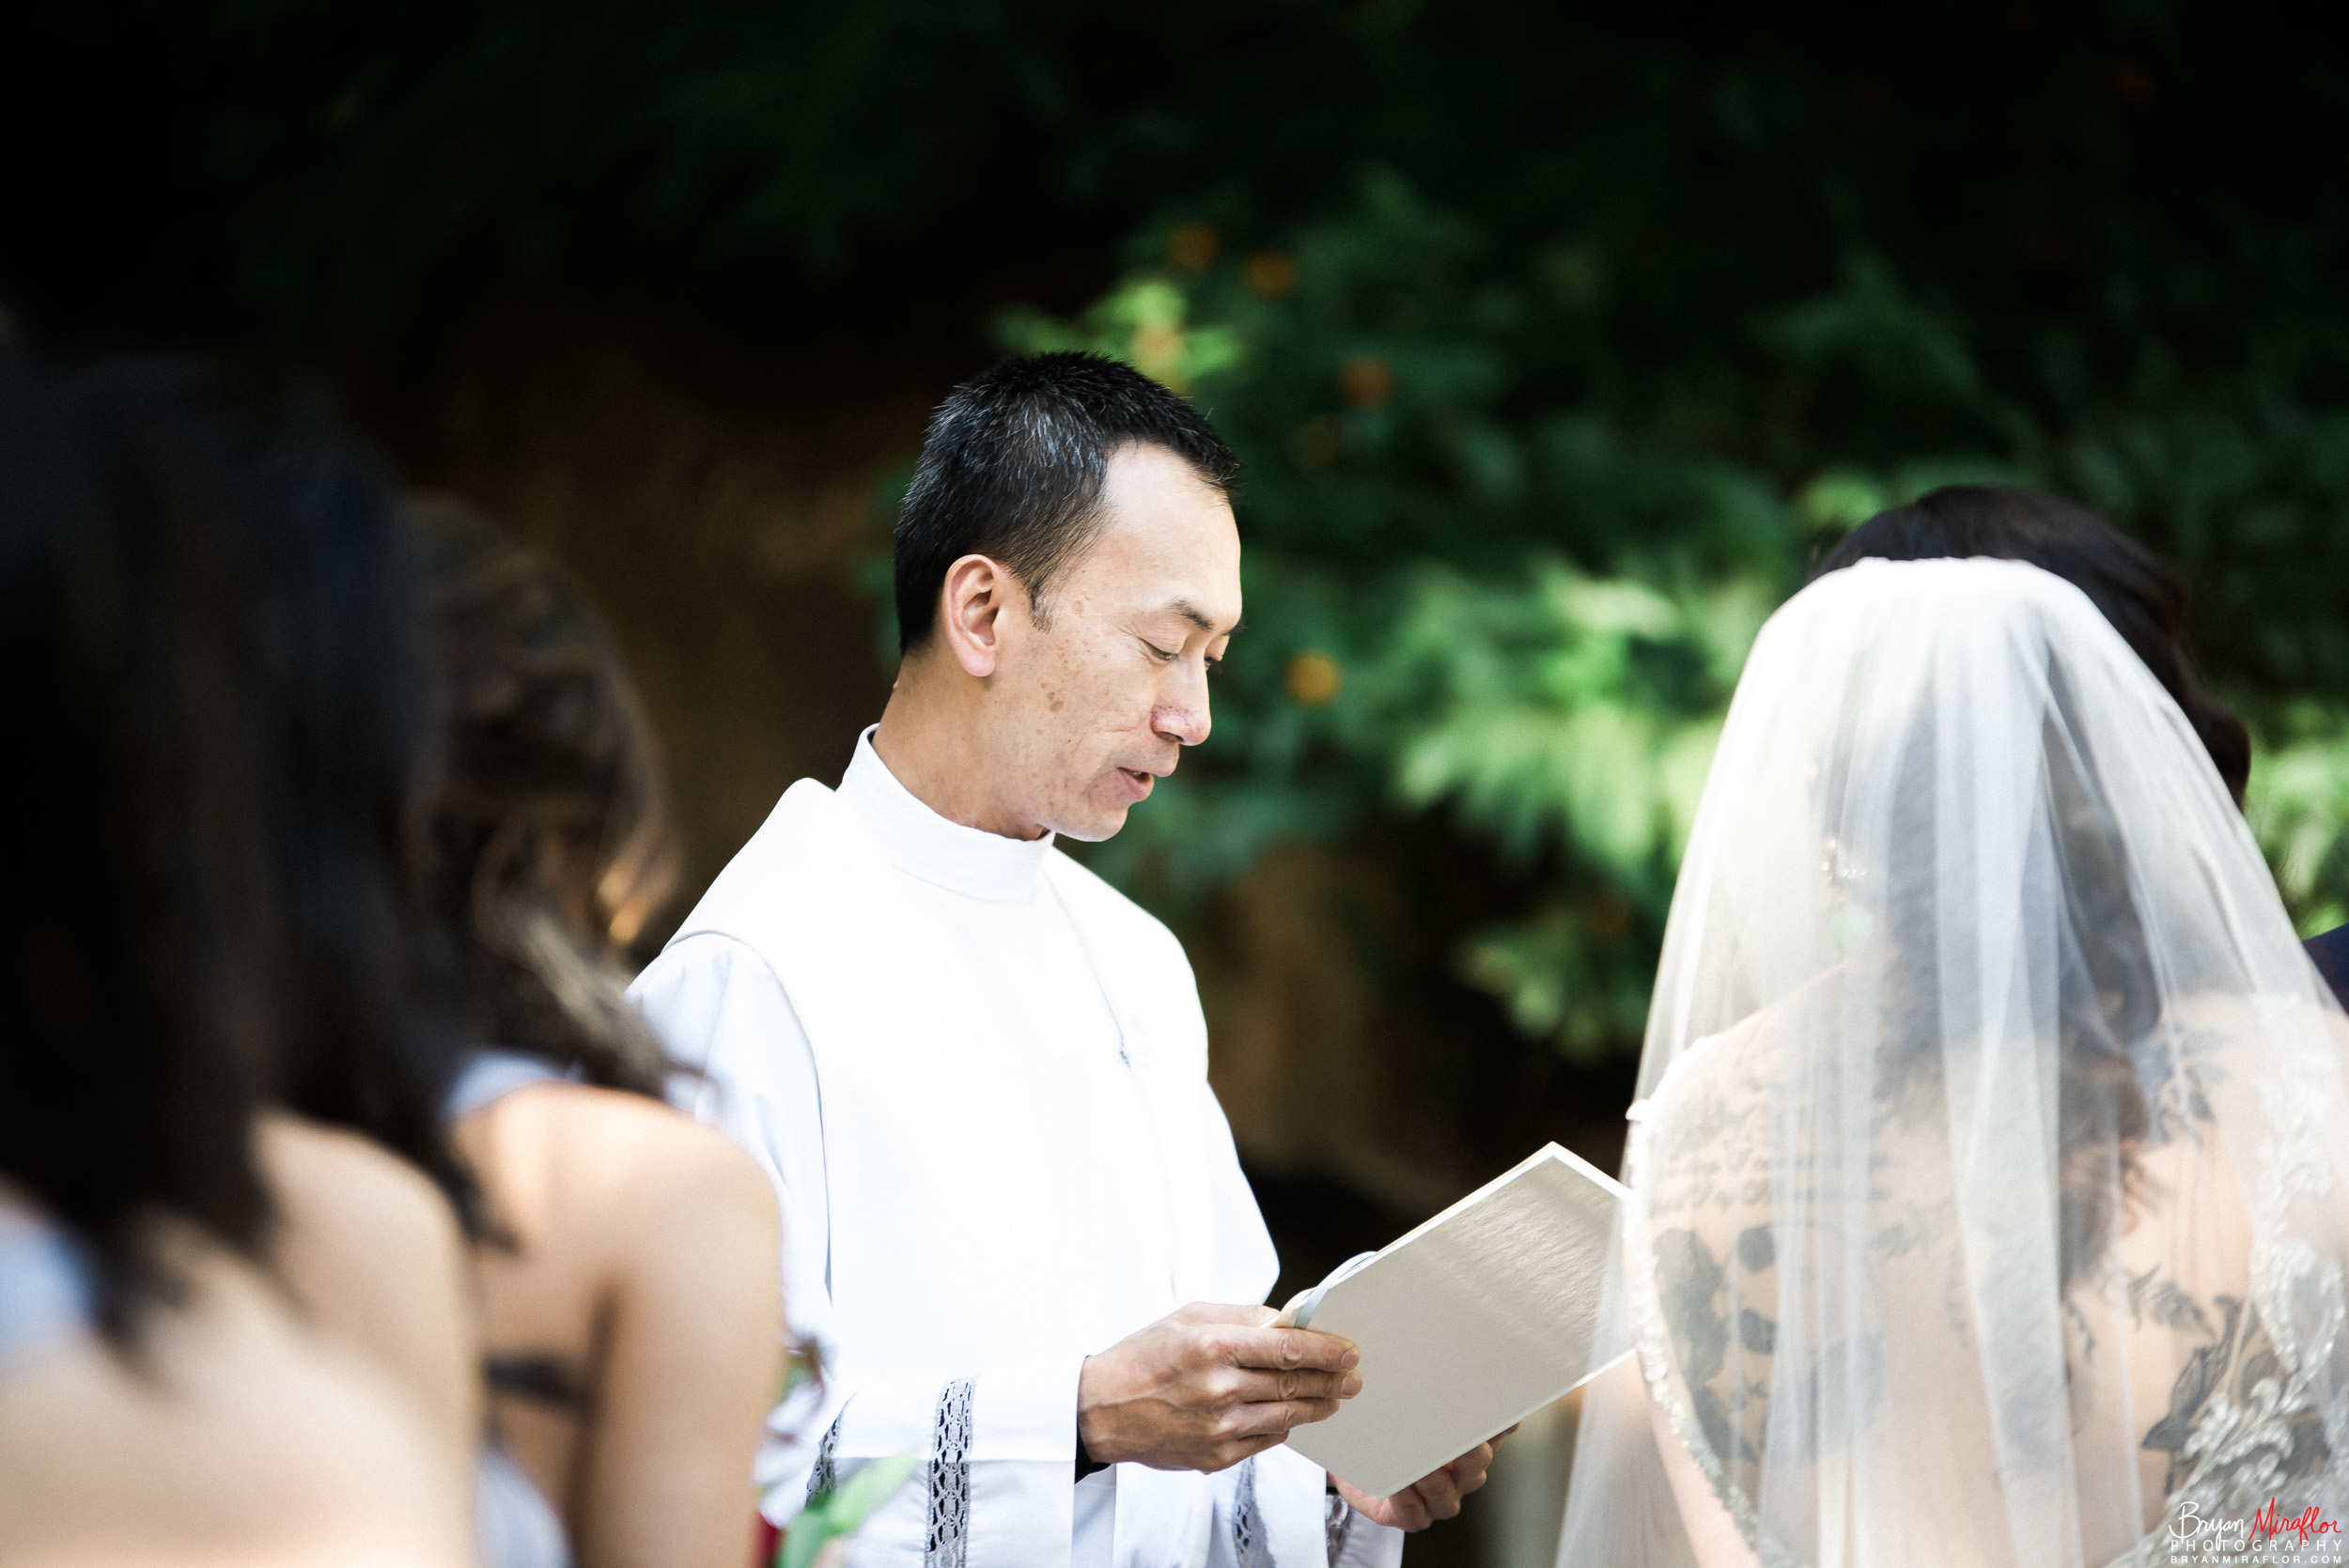 Bryan-Miraflor-Photography-Hannah-Jonathan-Married-Grand-Traditions-Estate-Gardens-Fallbrook-20171222-097.jpg